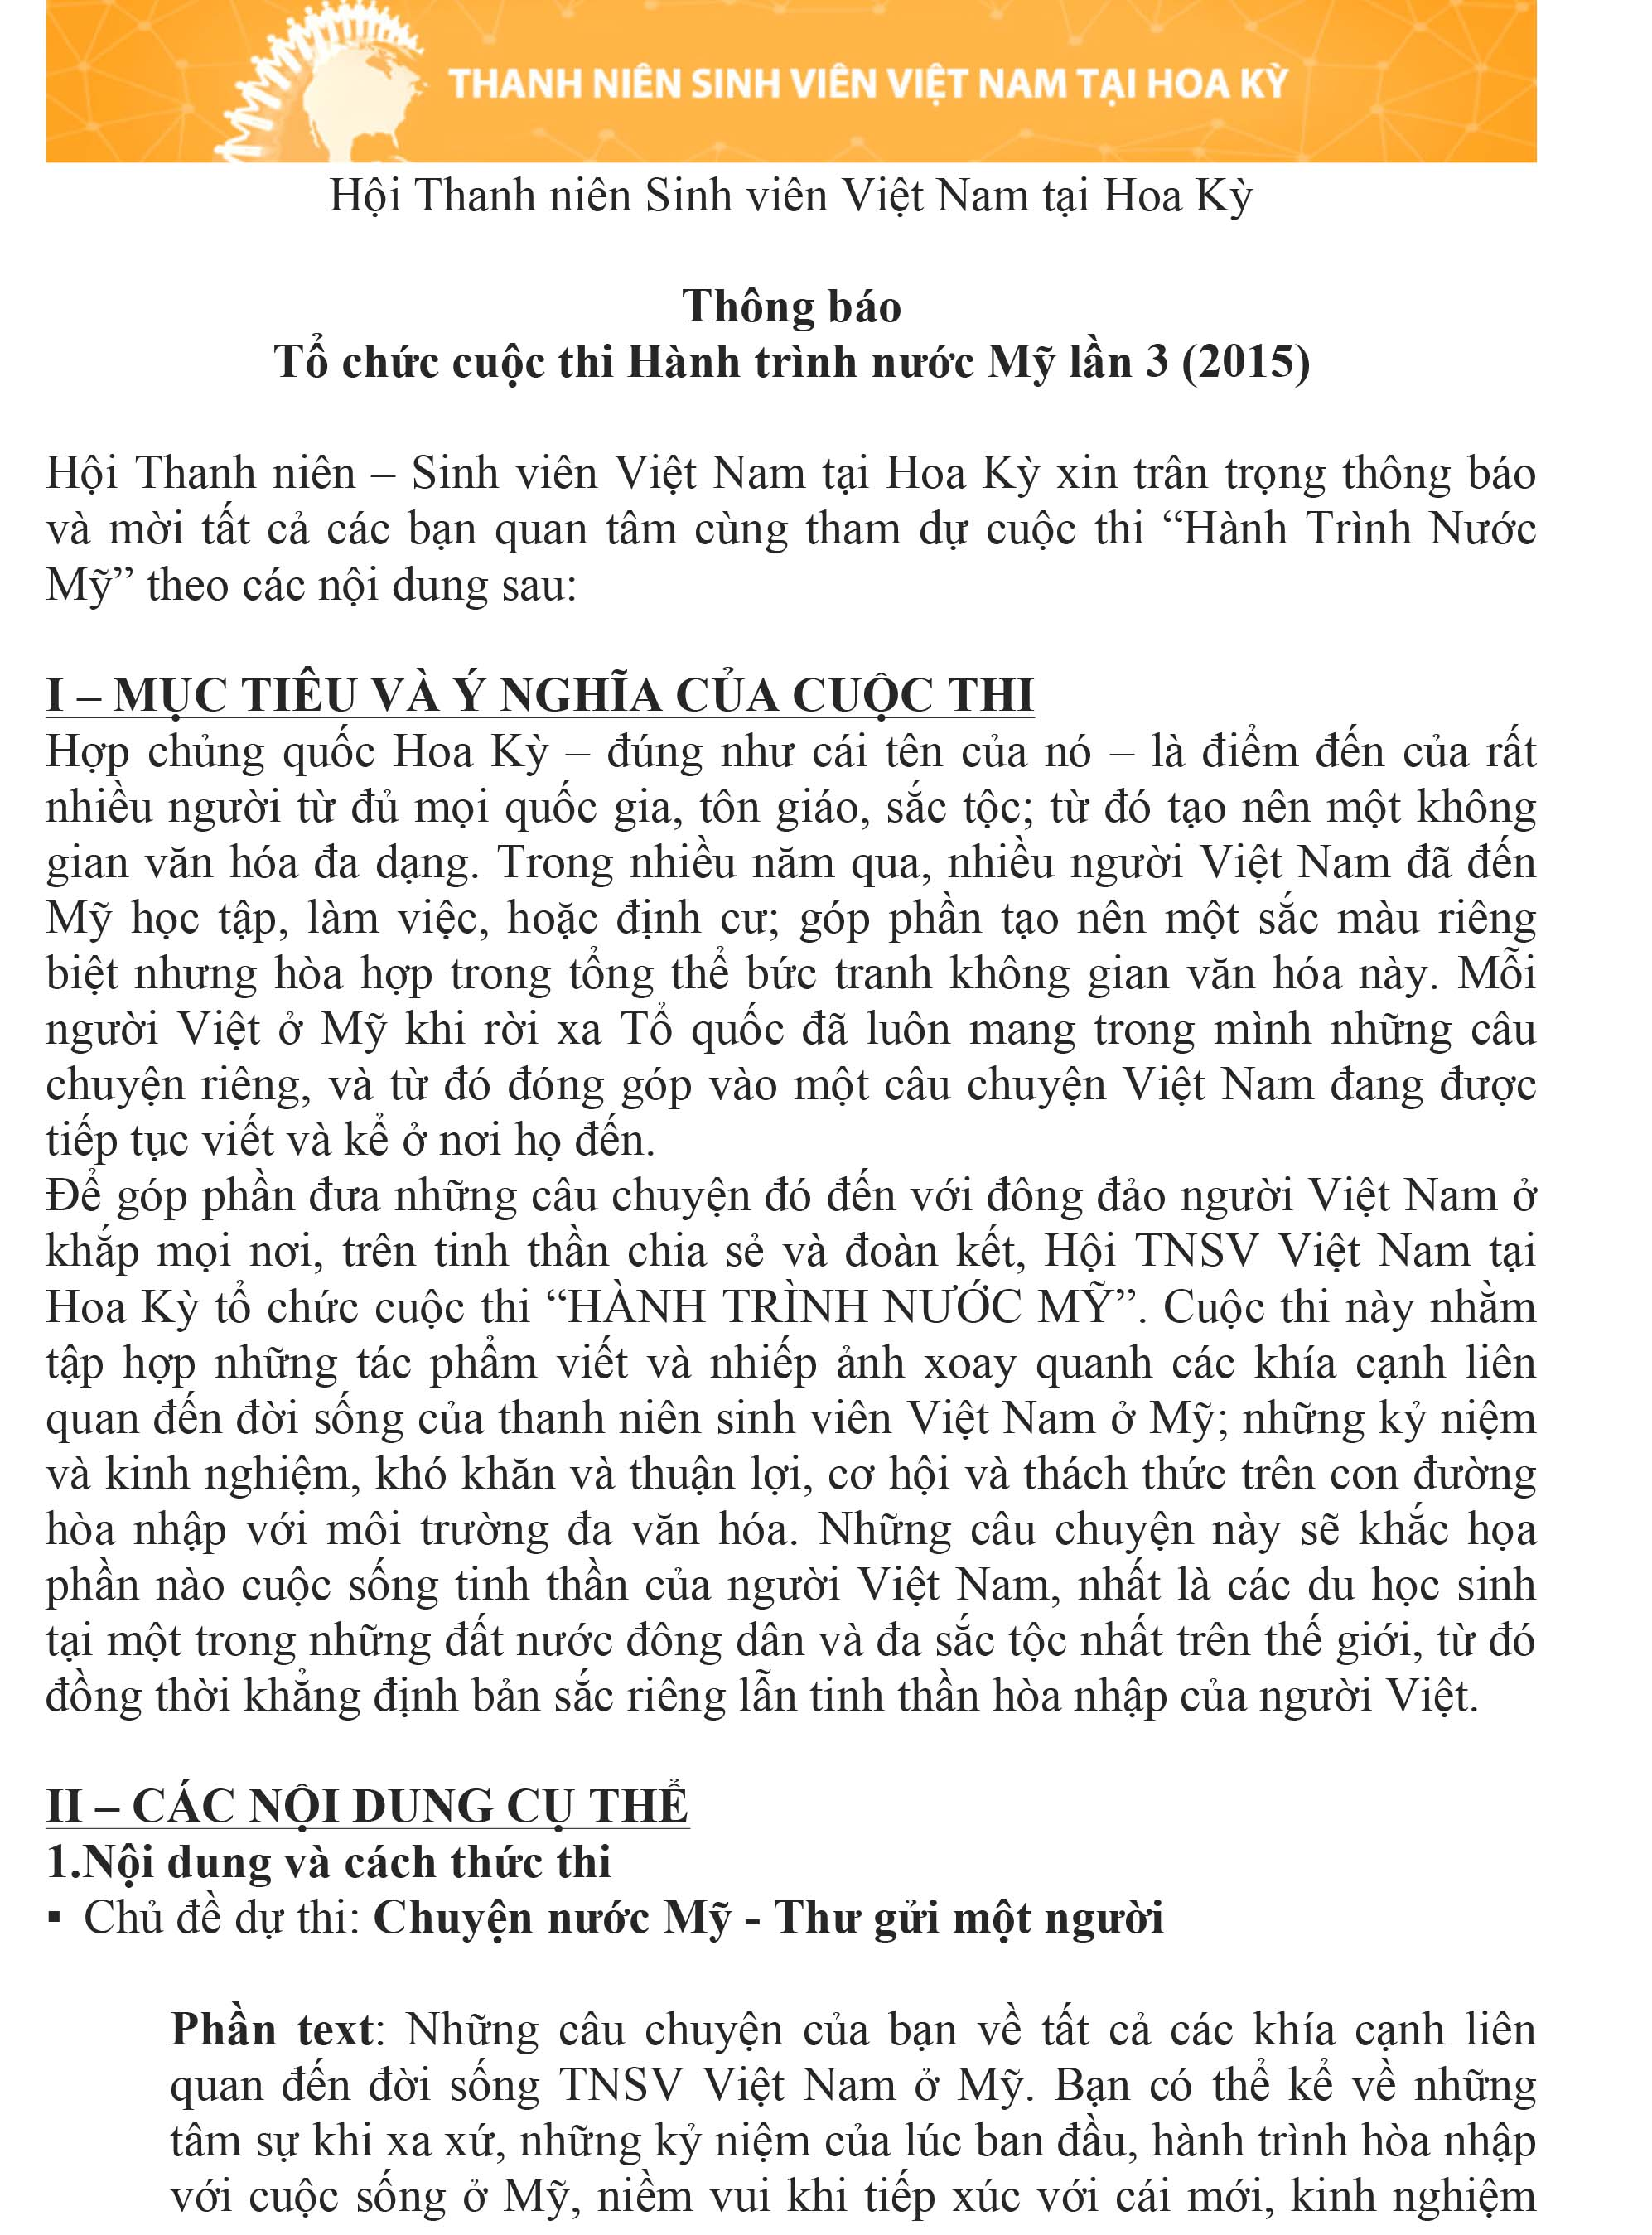 Microsoft Word - thong bao hanh trinh nuoc my 3 final .docx